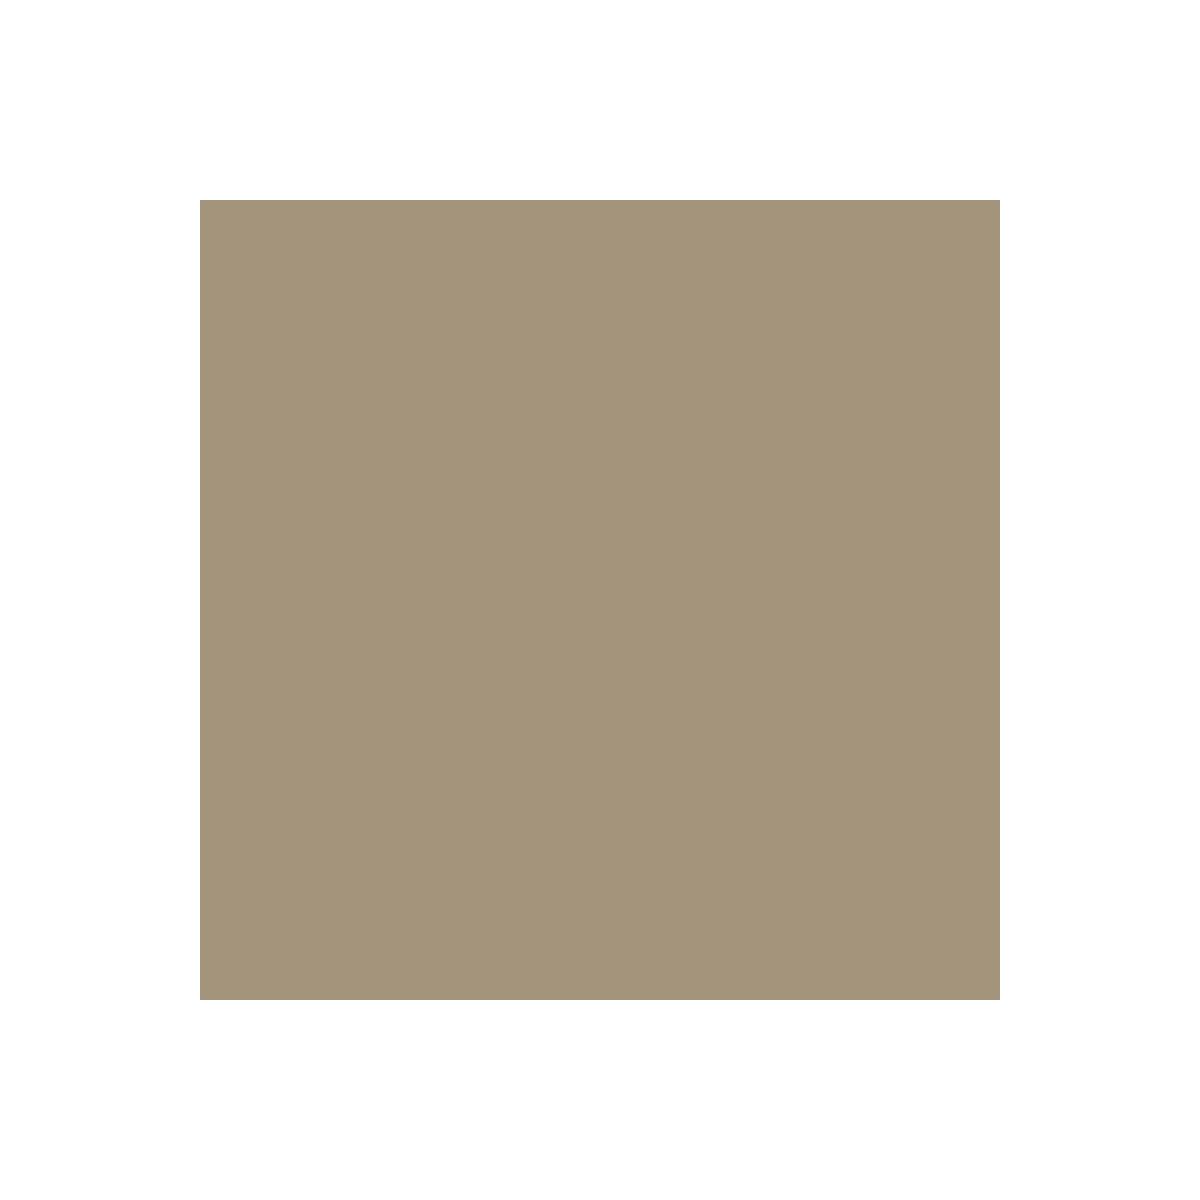 Peinture carrelage cuisine salle de bain r sine r novation - Peinture carrelage resine ...